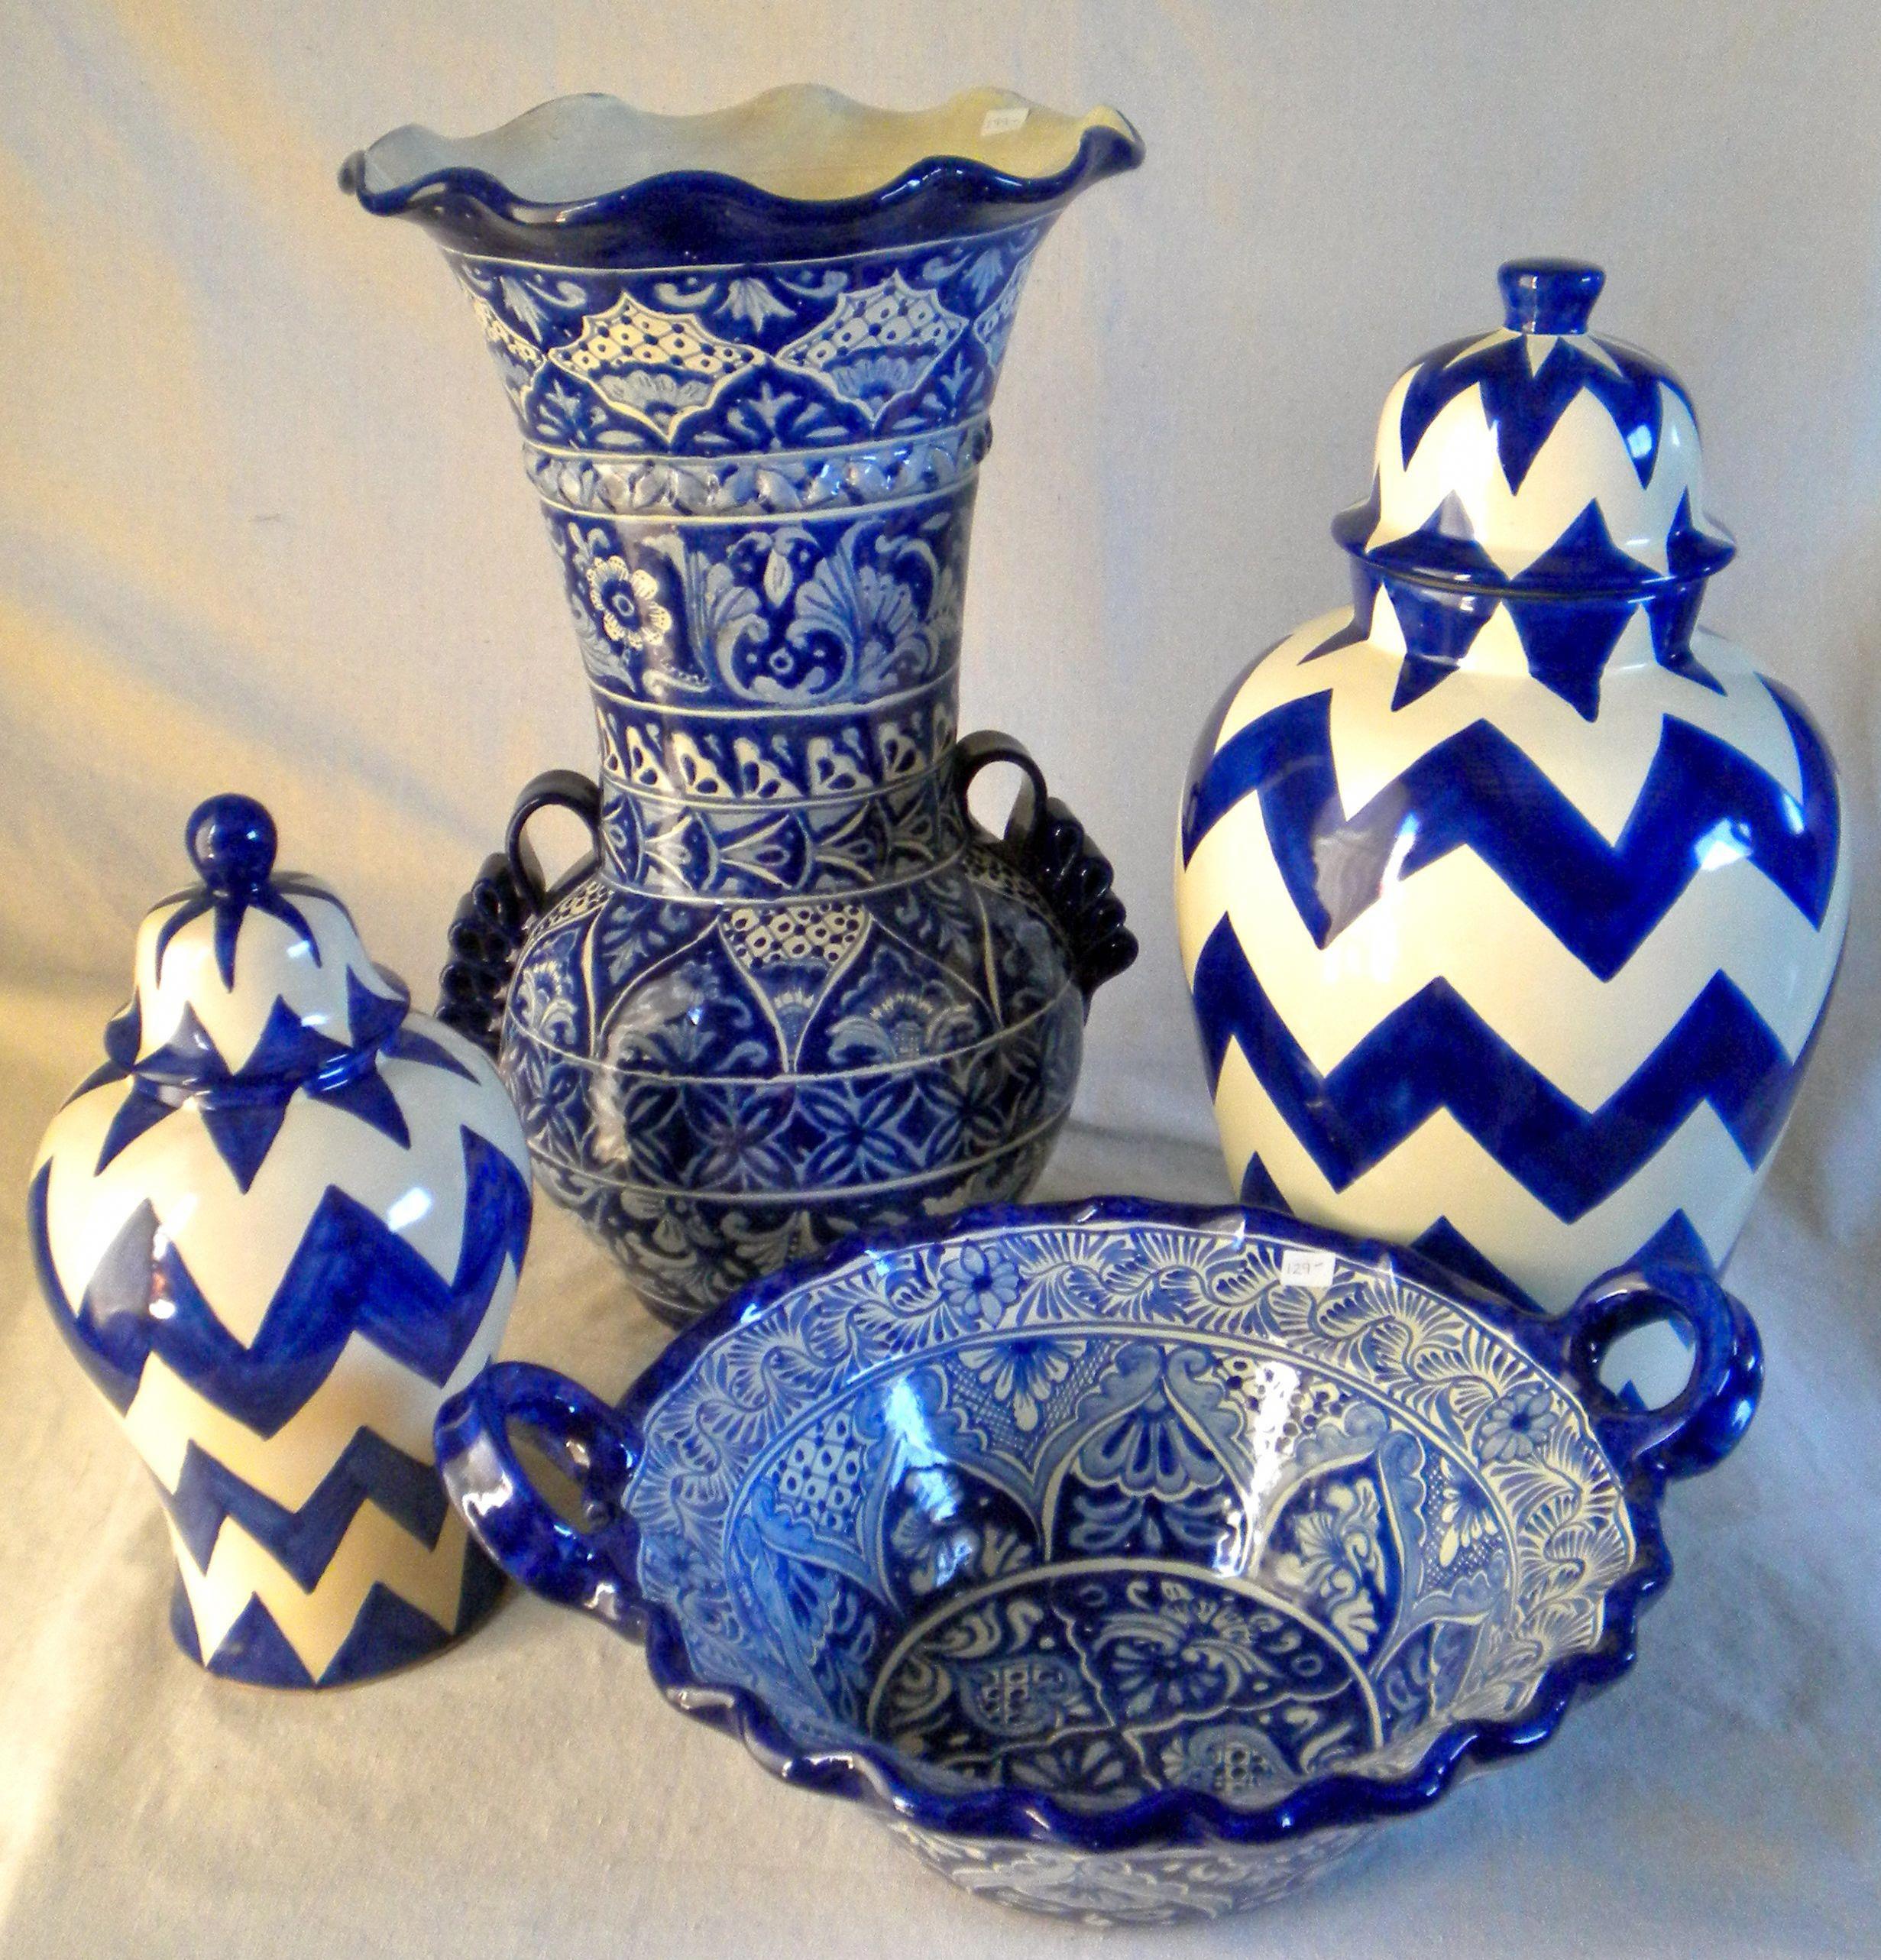 Types of Pottery Talavera poblana, Cosas de mexico